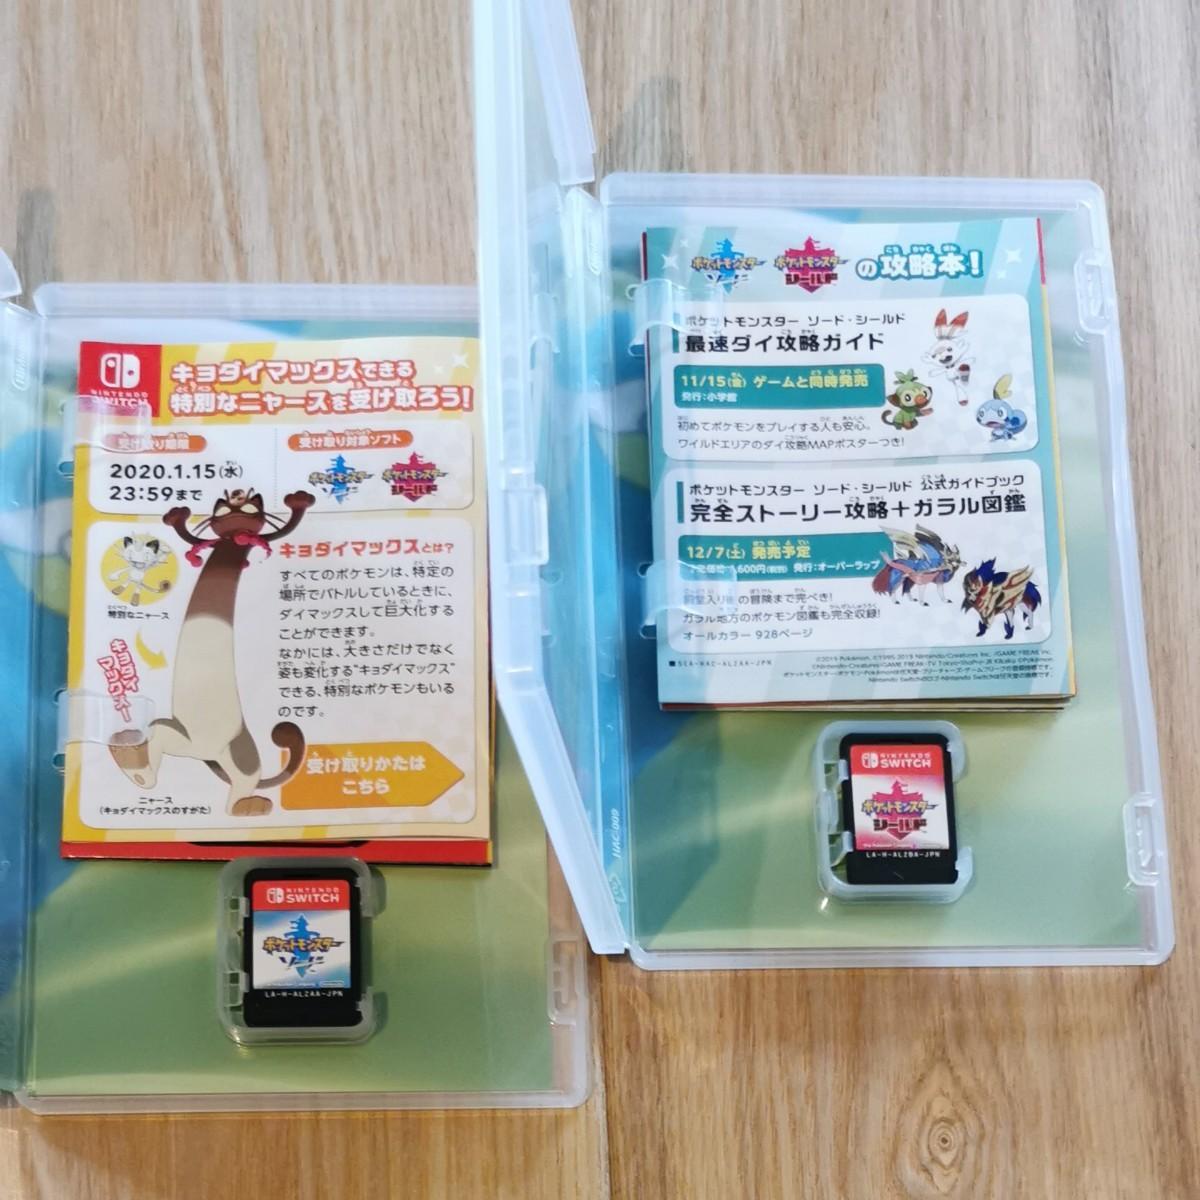 Nintendo Switch ポケットモンスター ソード シールド セット